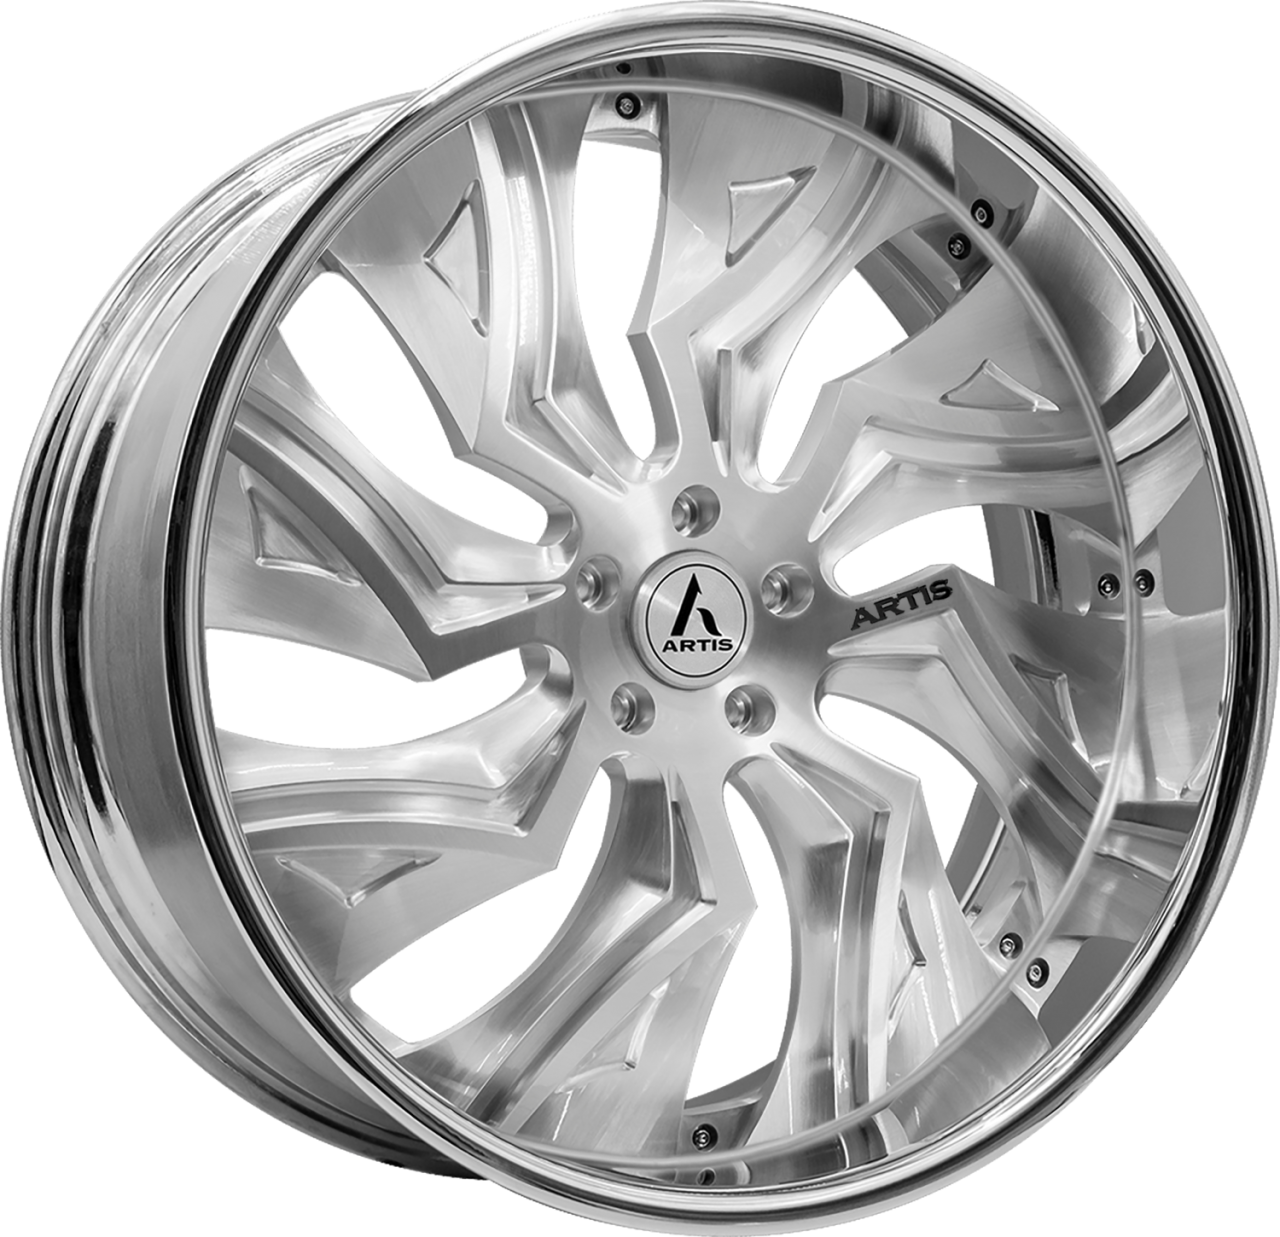 Artis Forged Buckeye-M wheel with Brushed finish